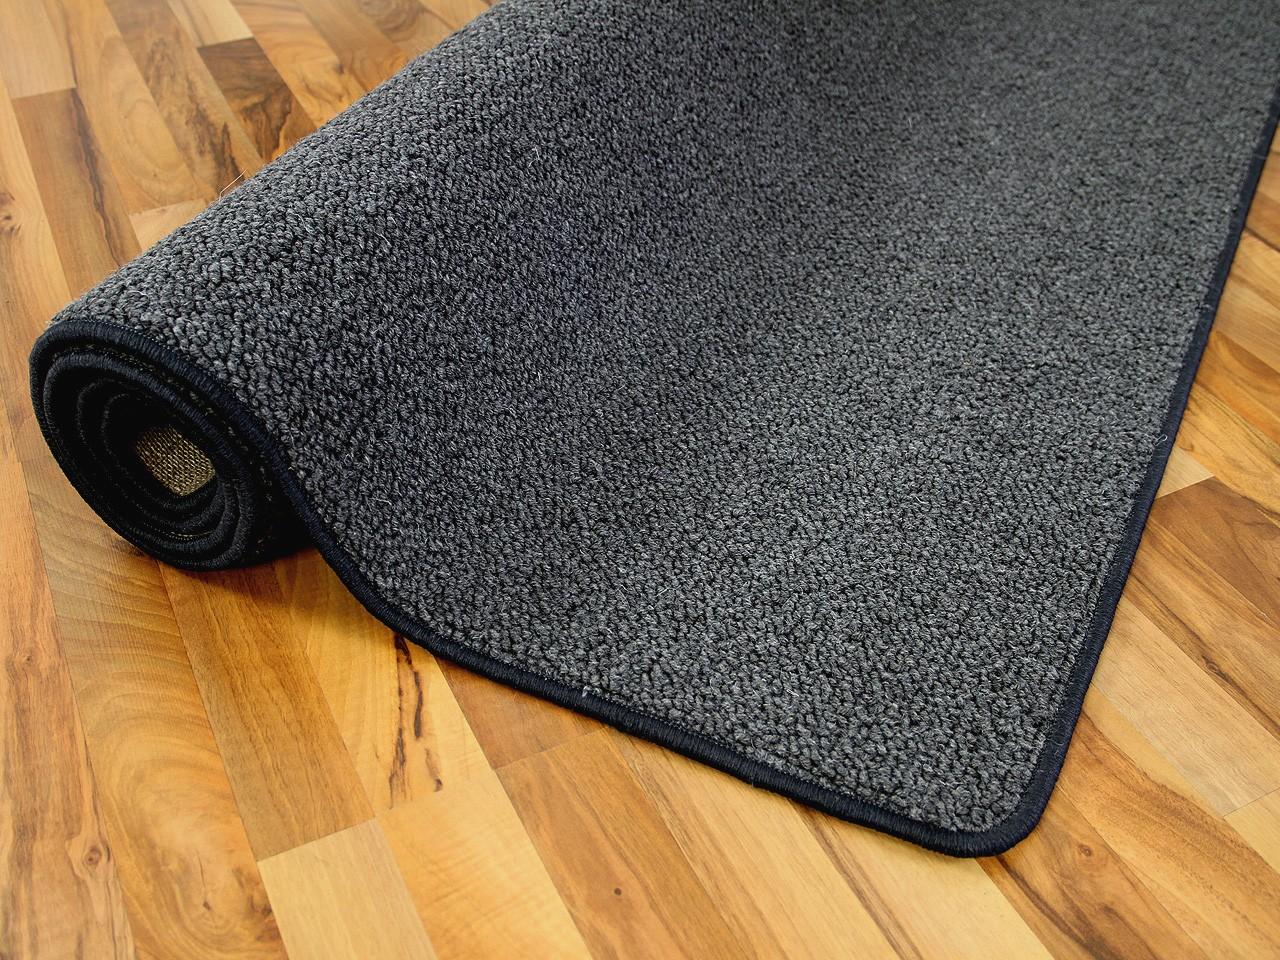 natur teppich luxus berber venice anthrazit abverkauf teppiche sisal und naturteppiche berber. Black Bedroom Furniture Sets. Home Design Ideas